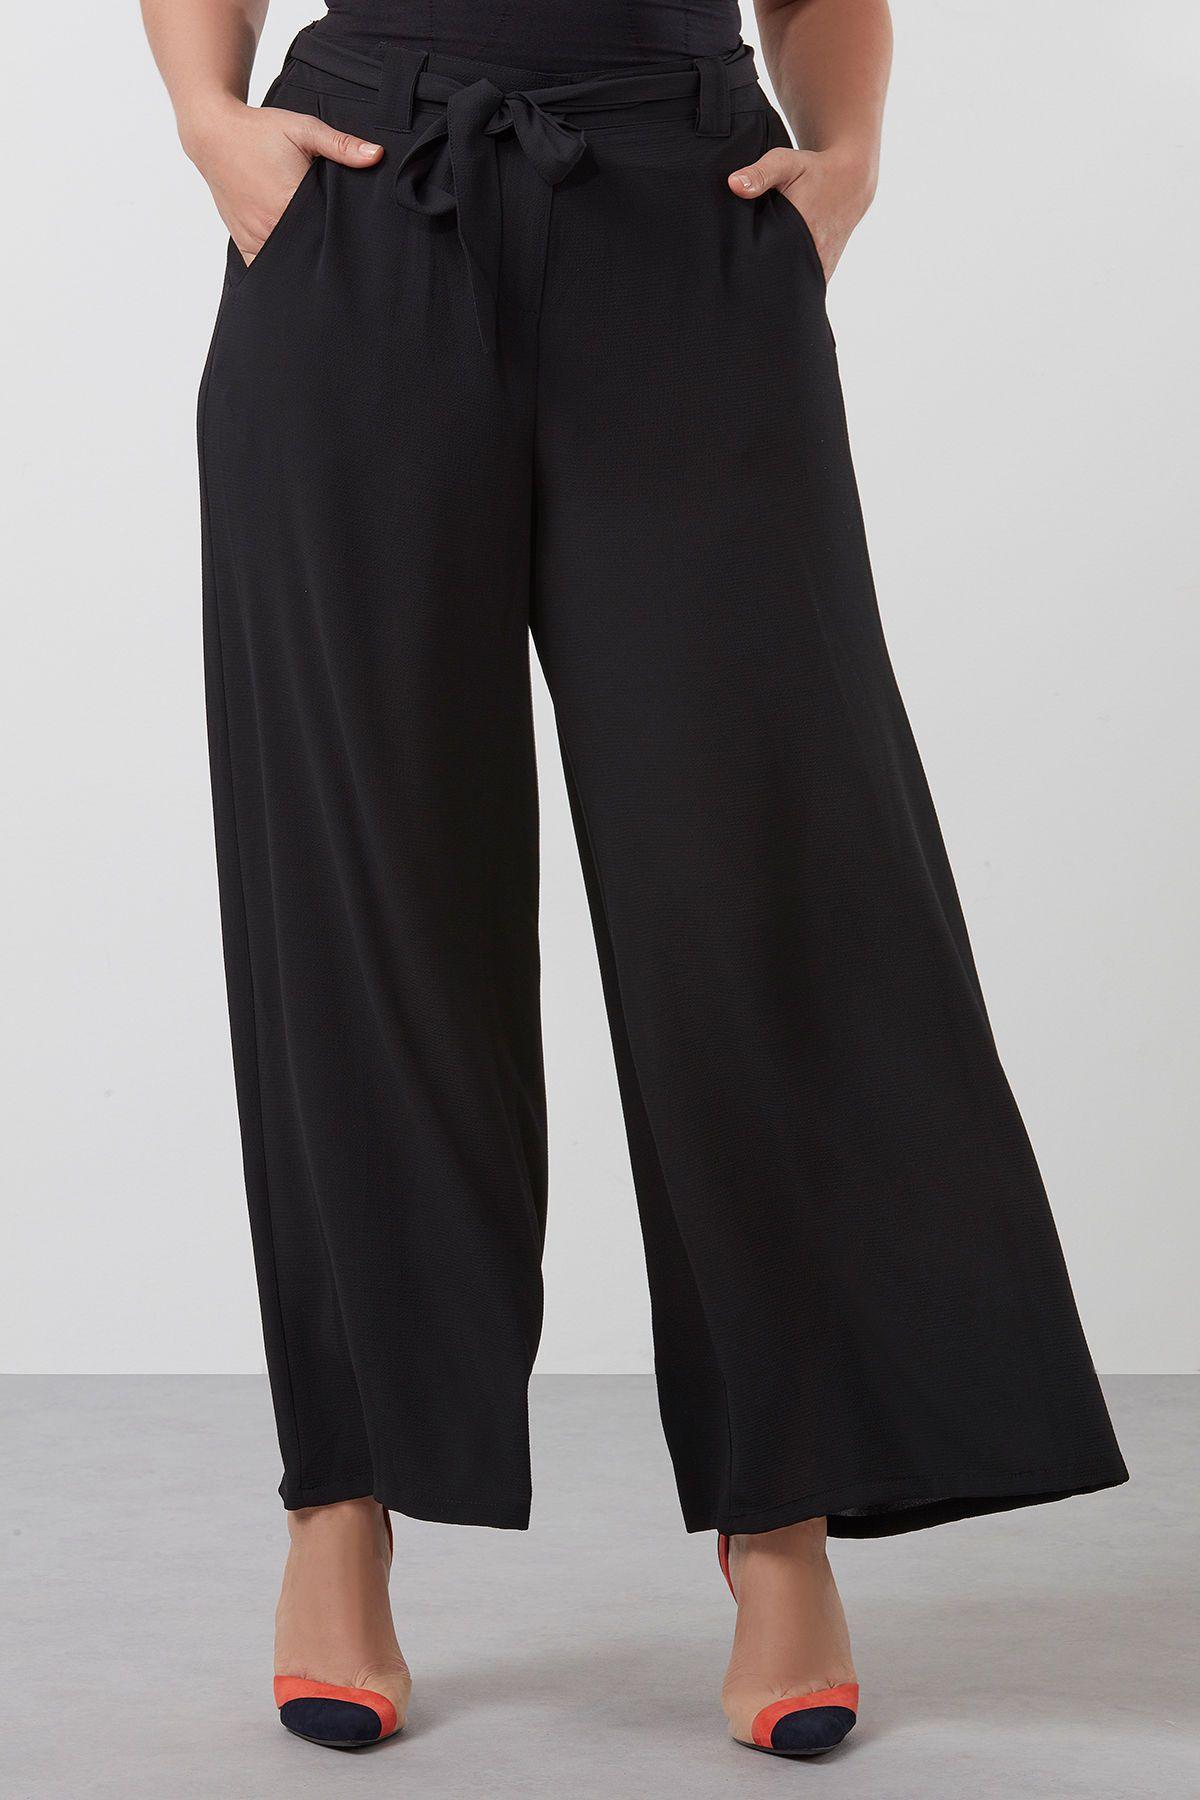 Noir Pantalon Large A Ms Mode Selection Ms Mode Pinterest